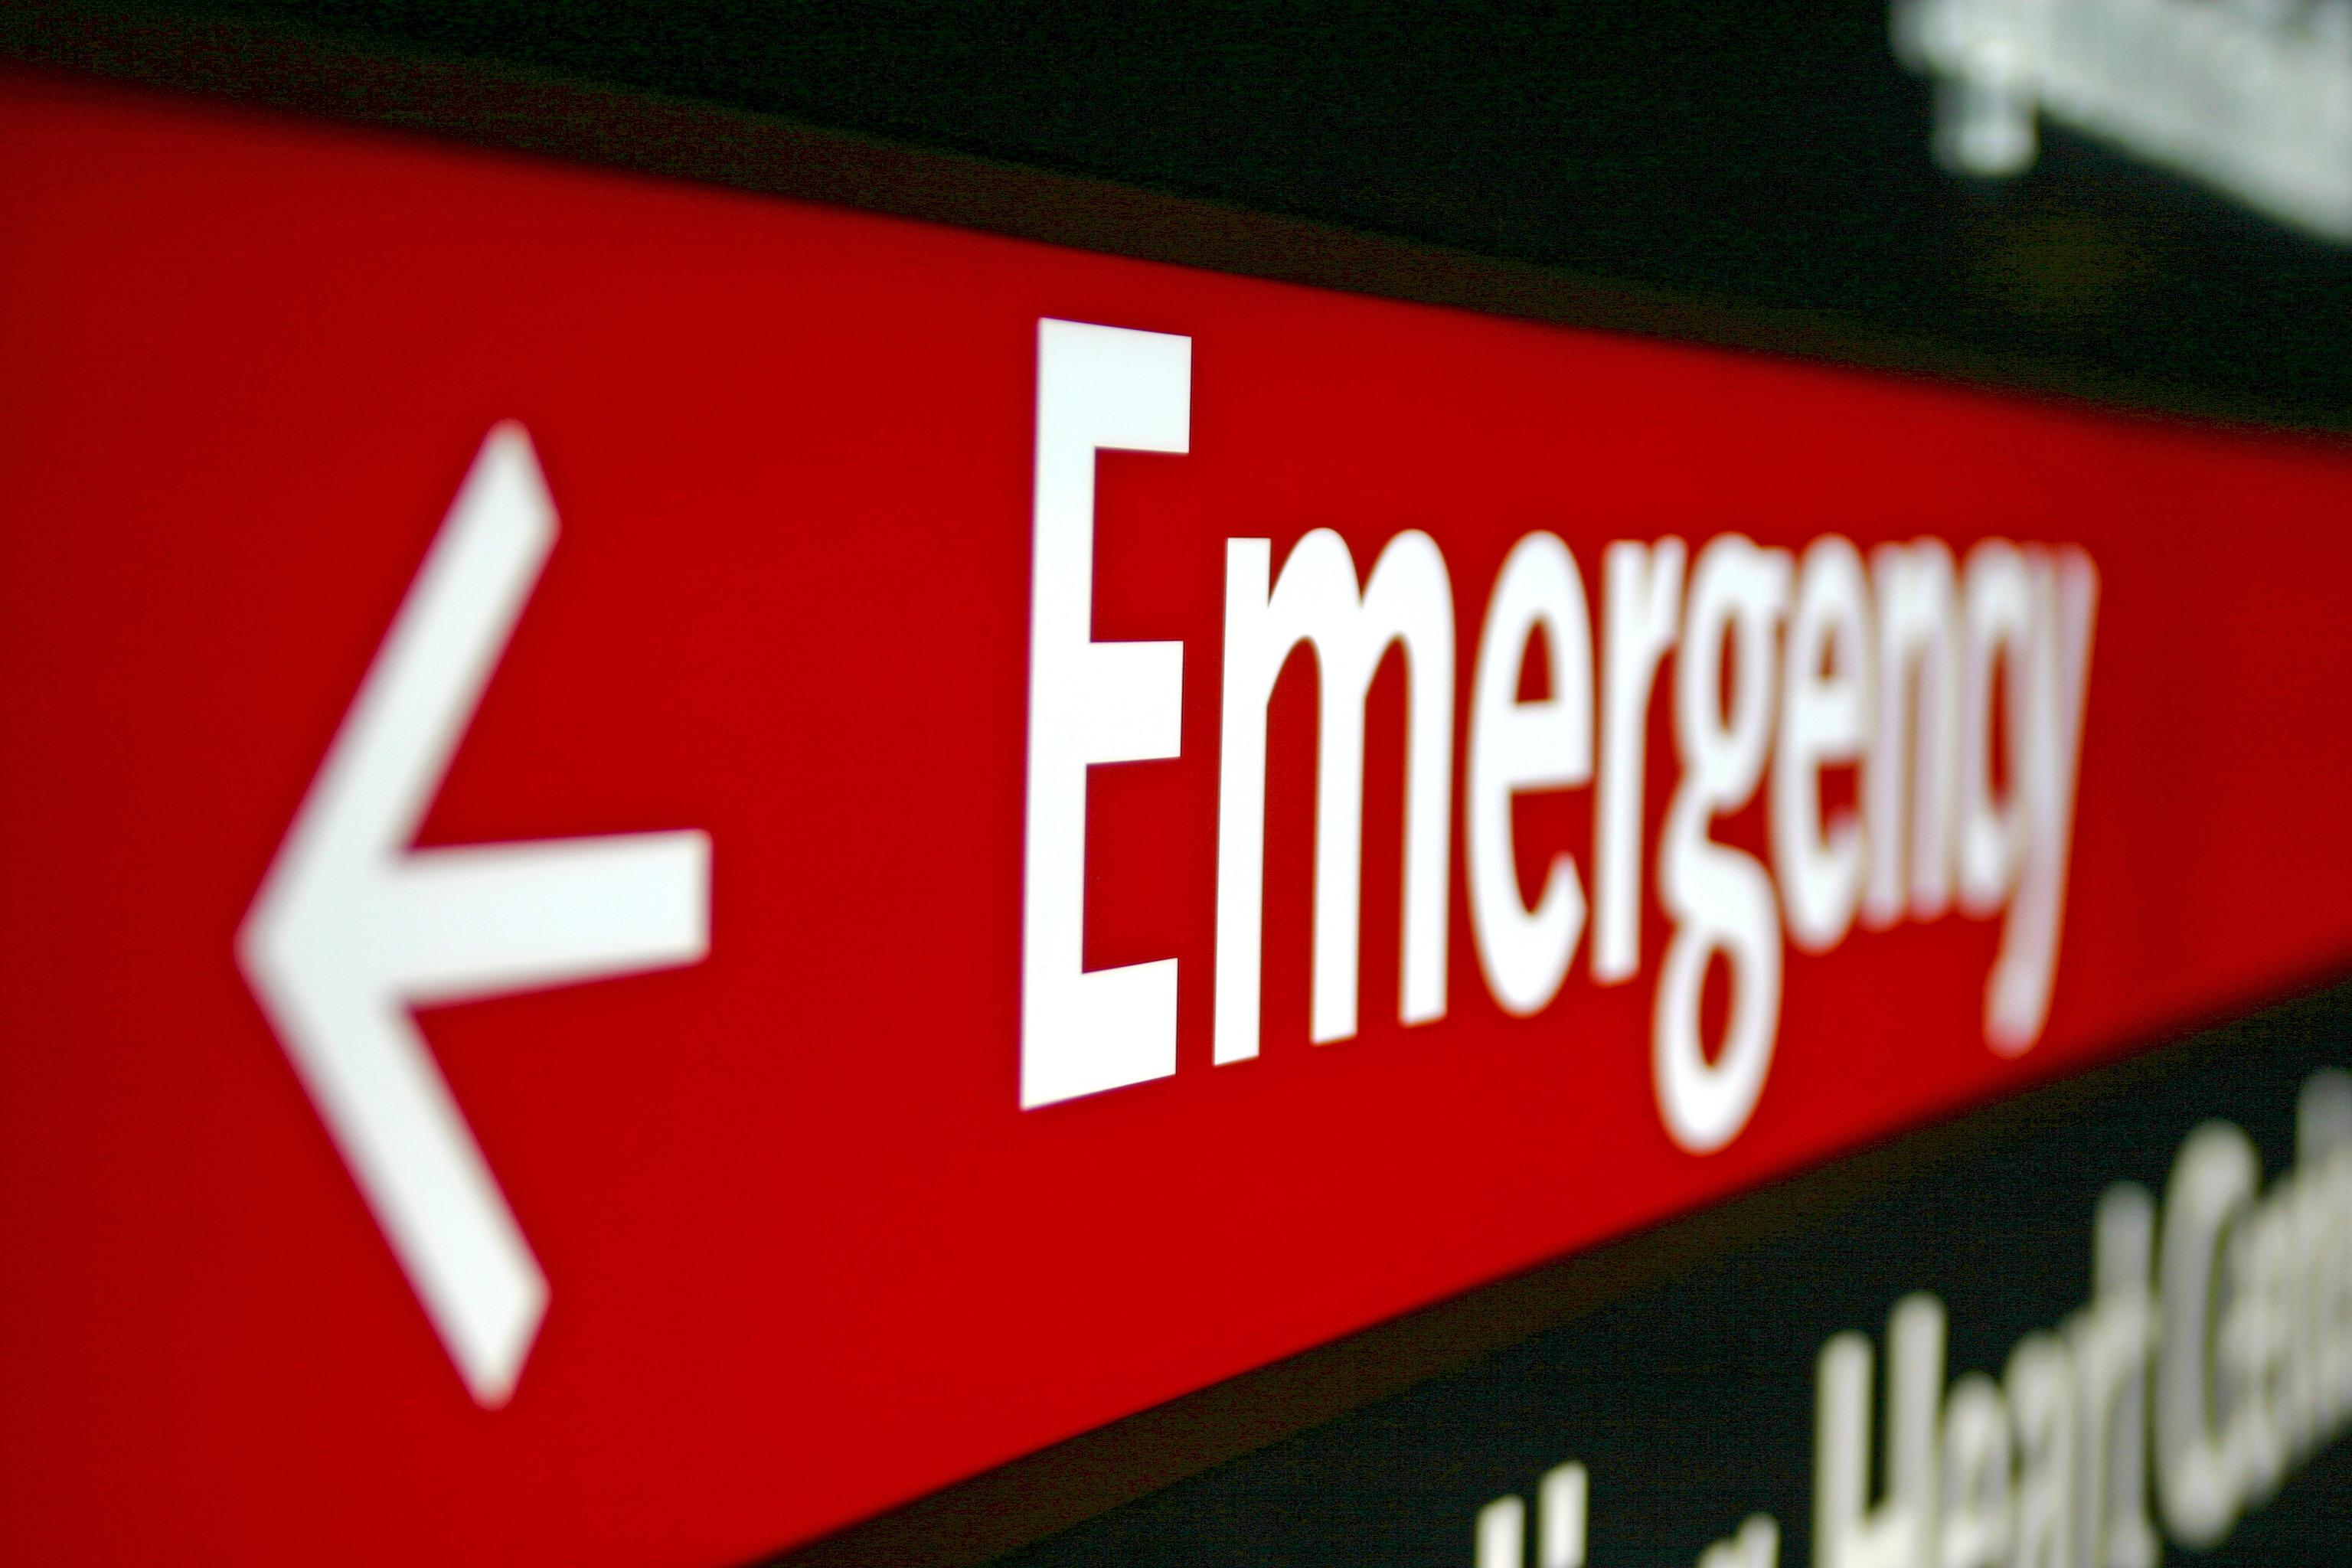 An emergency sign